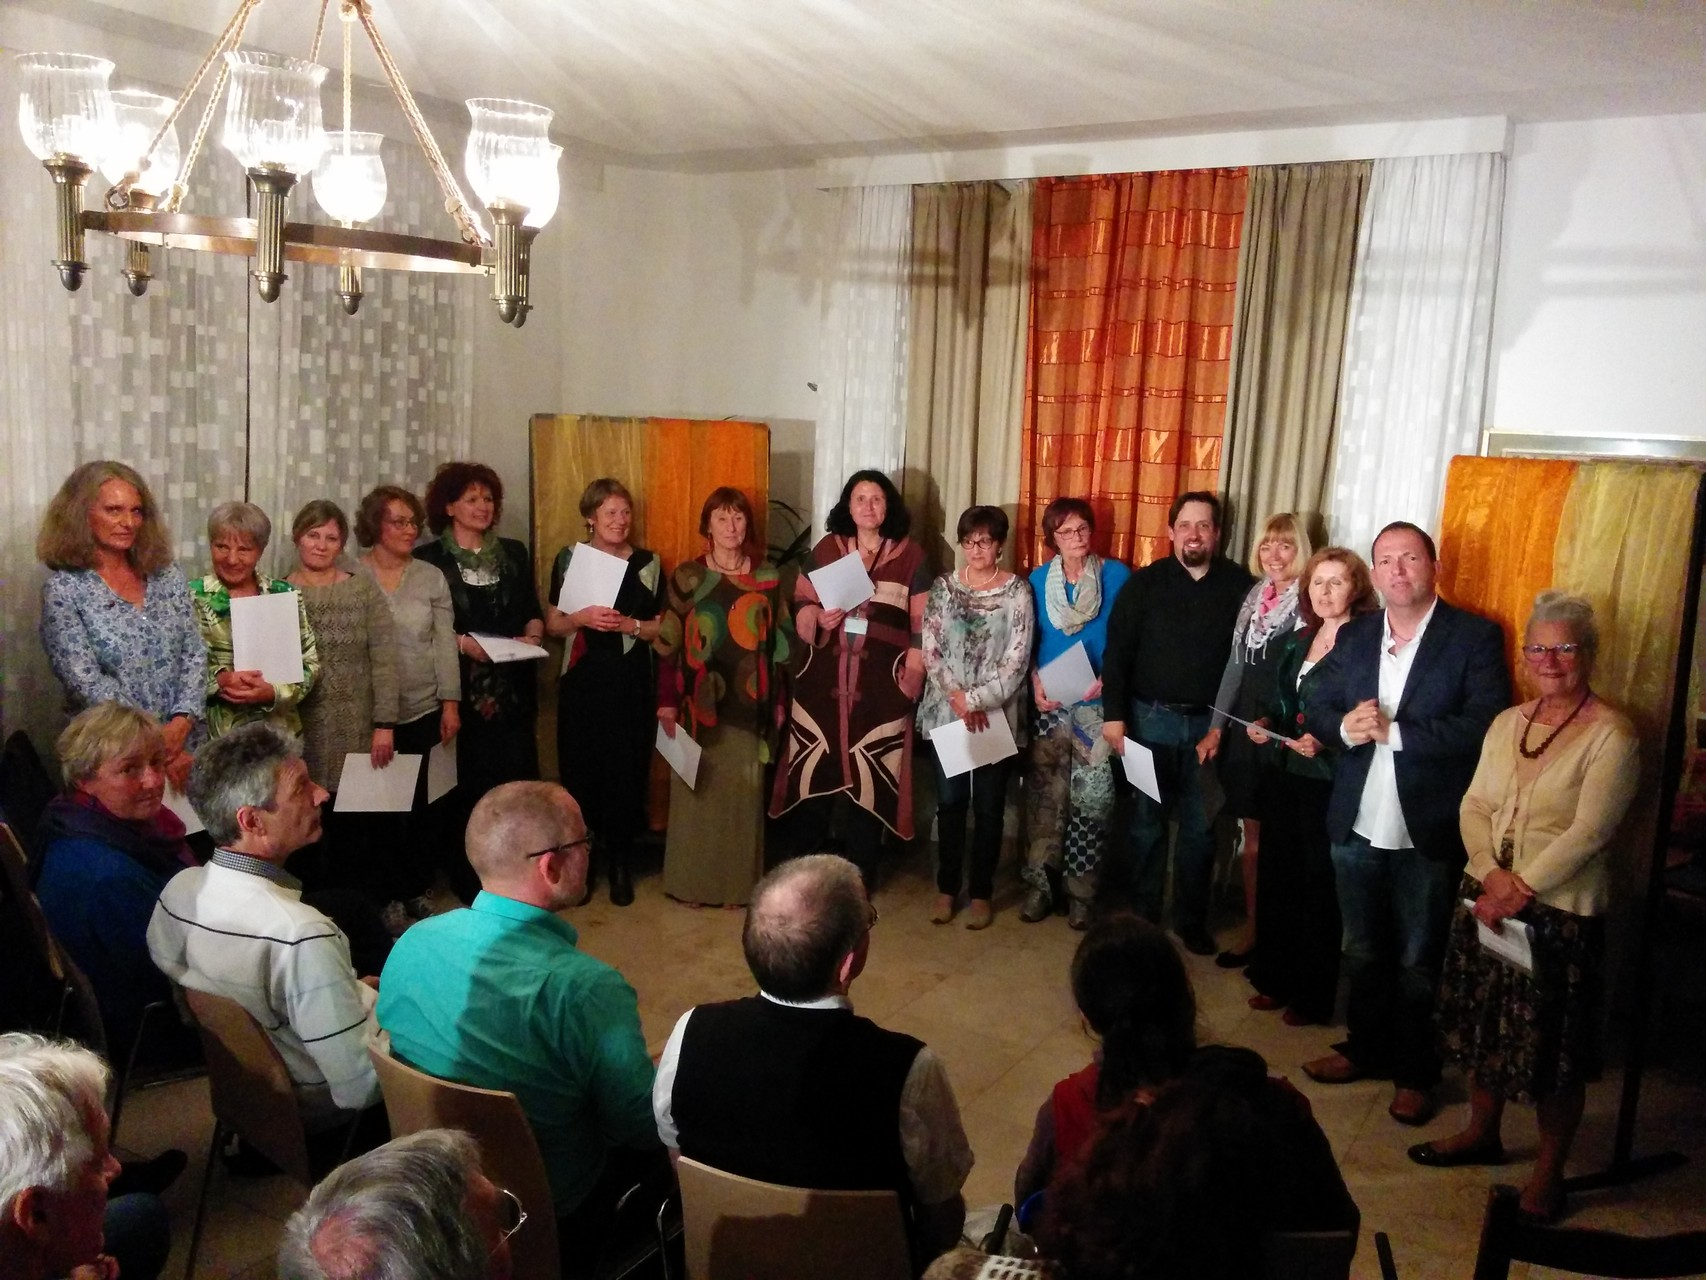 2014/2015 - Haus Buchenried am Starnberger See